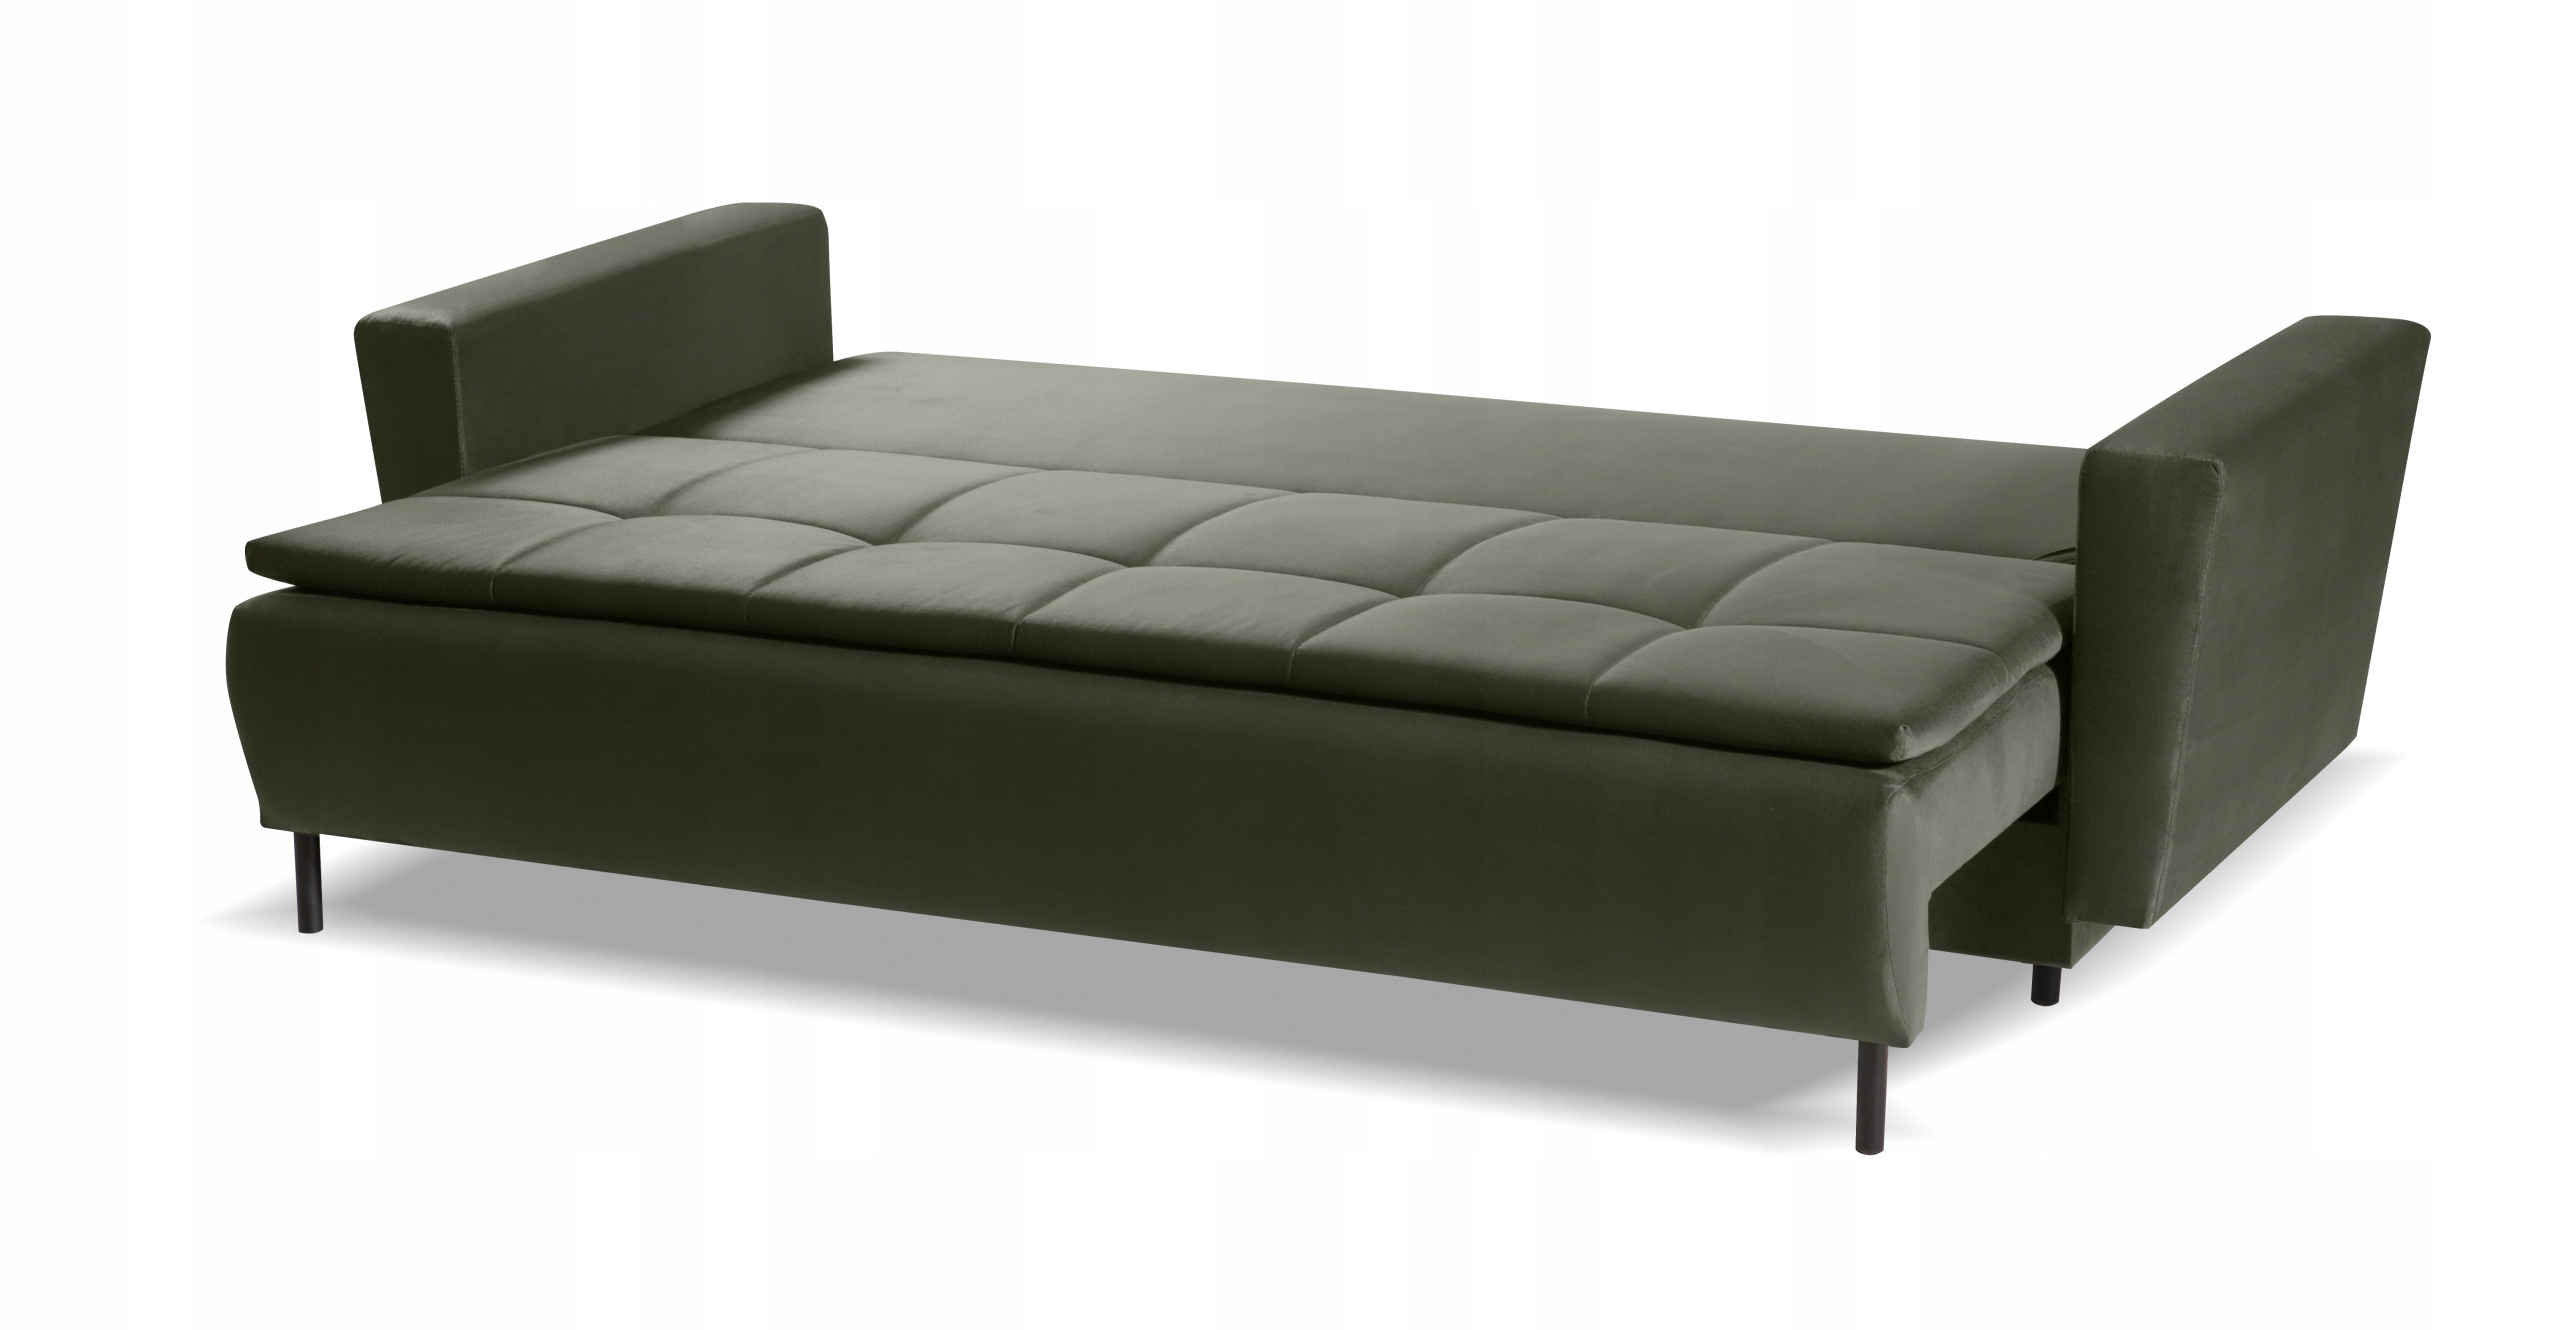 Großes Sofa SARA Schlafsofa Klappsofa - Farben Möbelhöhe 87 cm